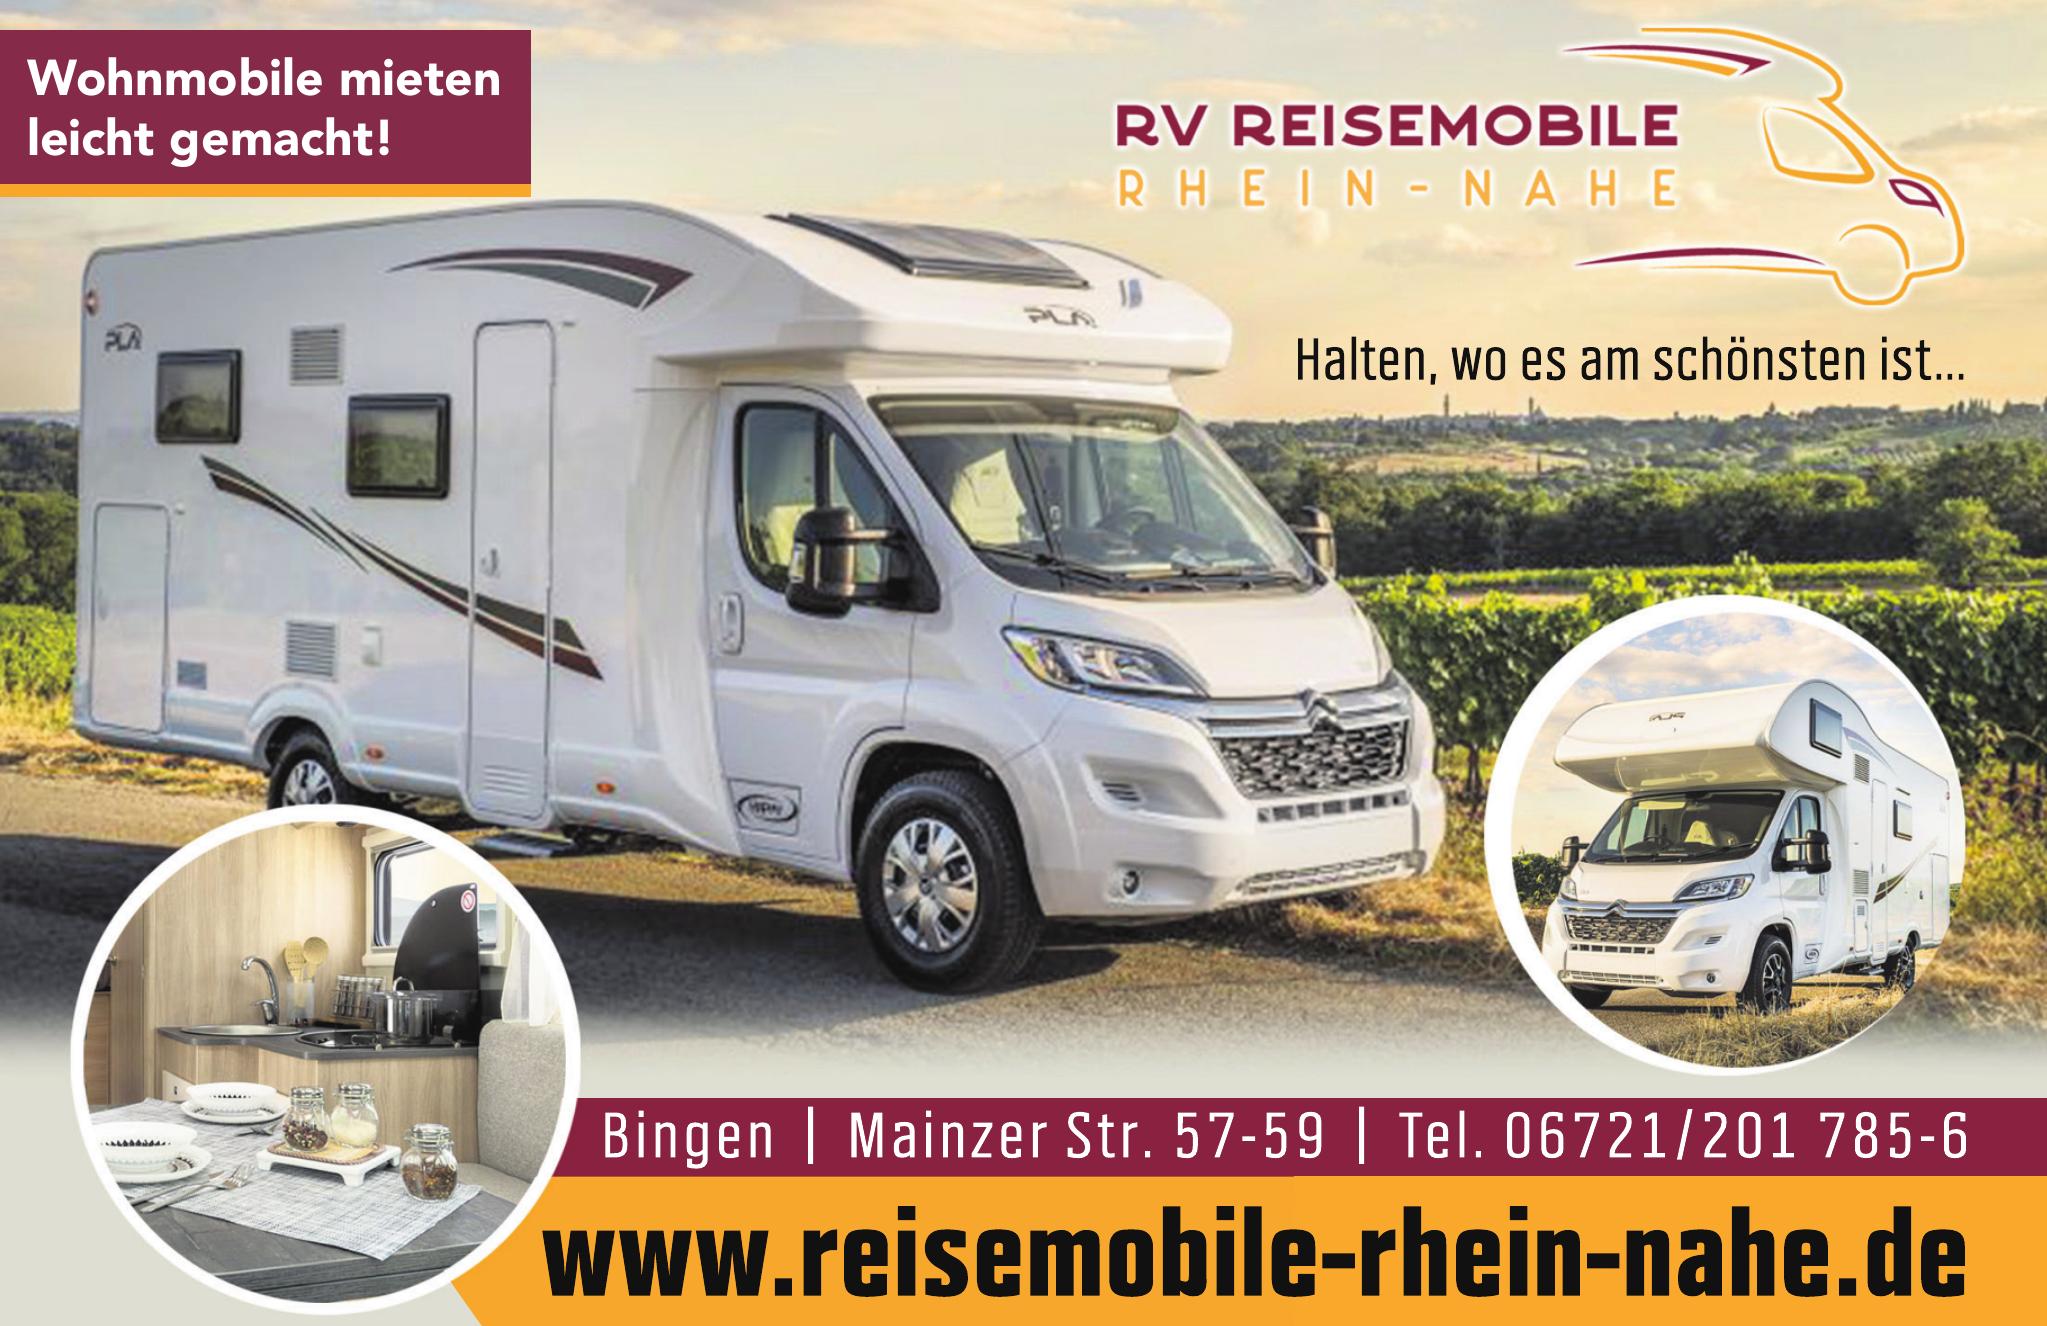 RV Reisemobile Rhein-Nahe